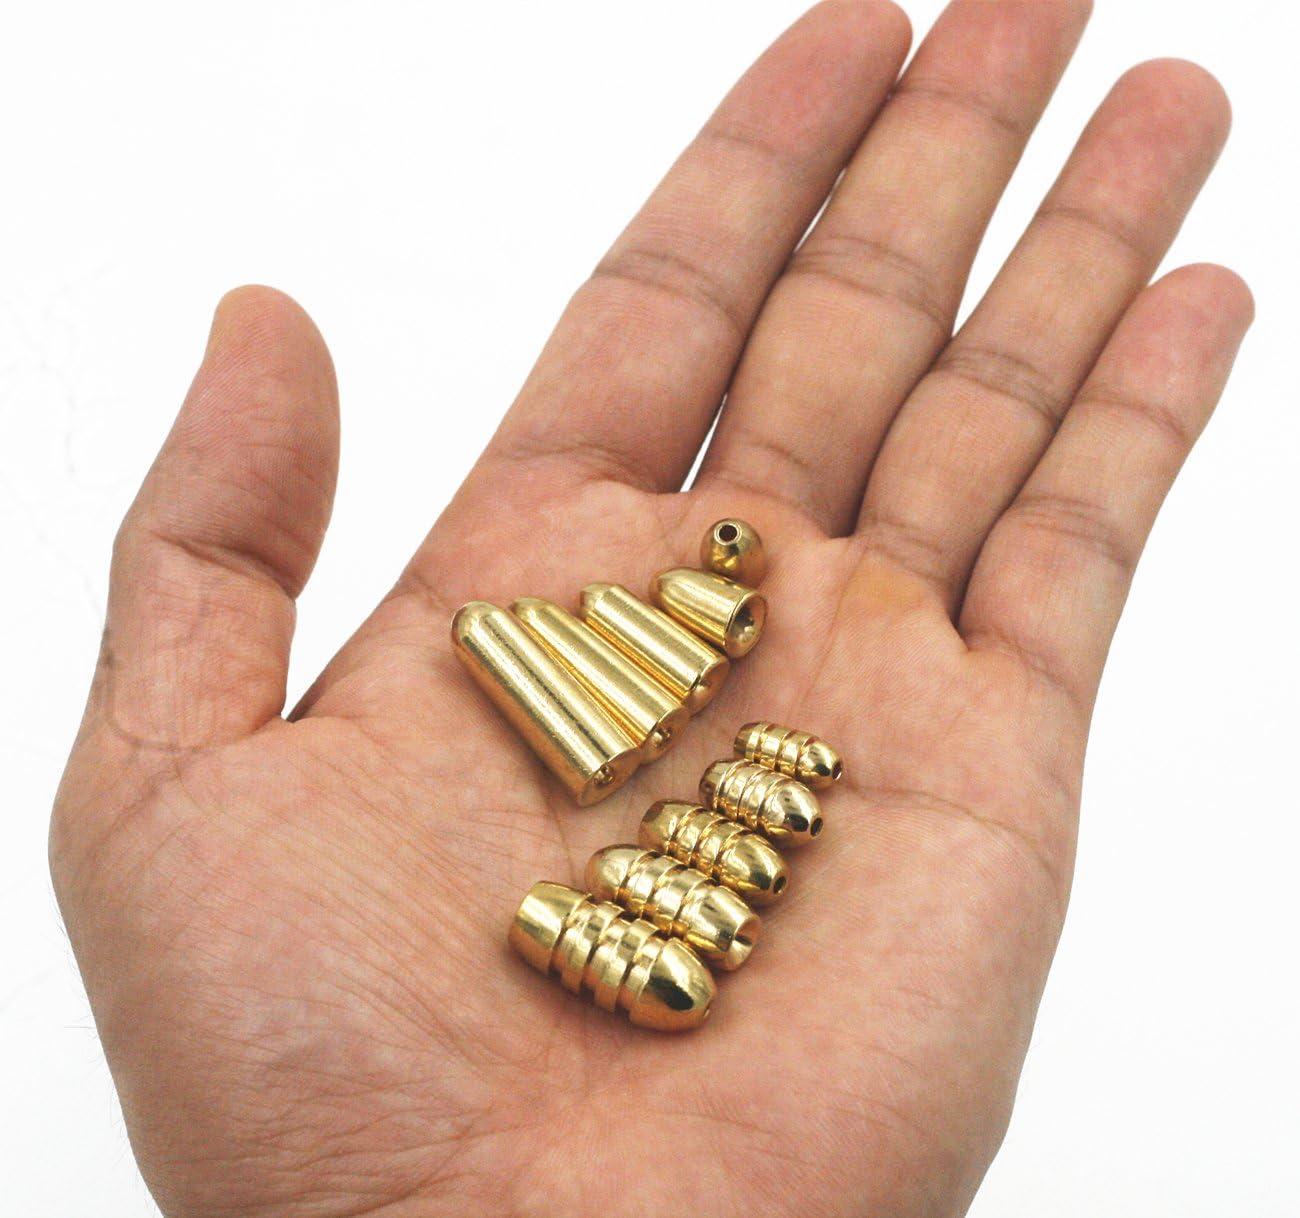 Professional Blinker spinner Body Brass Gaming Texas Carolina Rig Bullet Weight